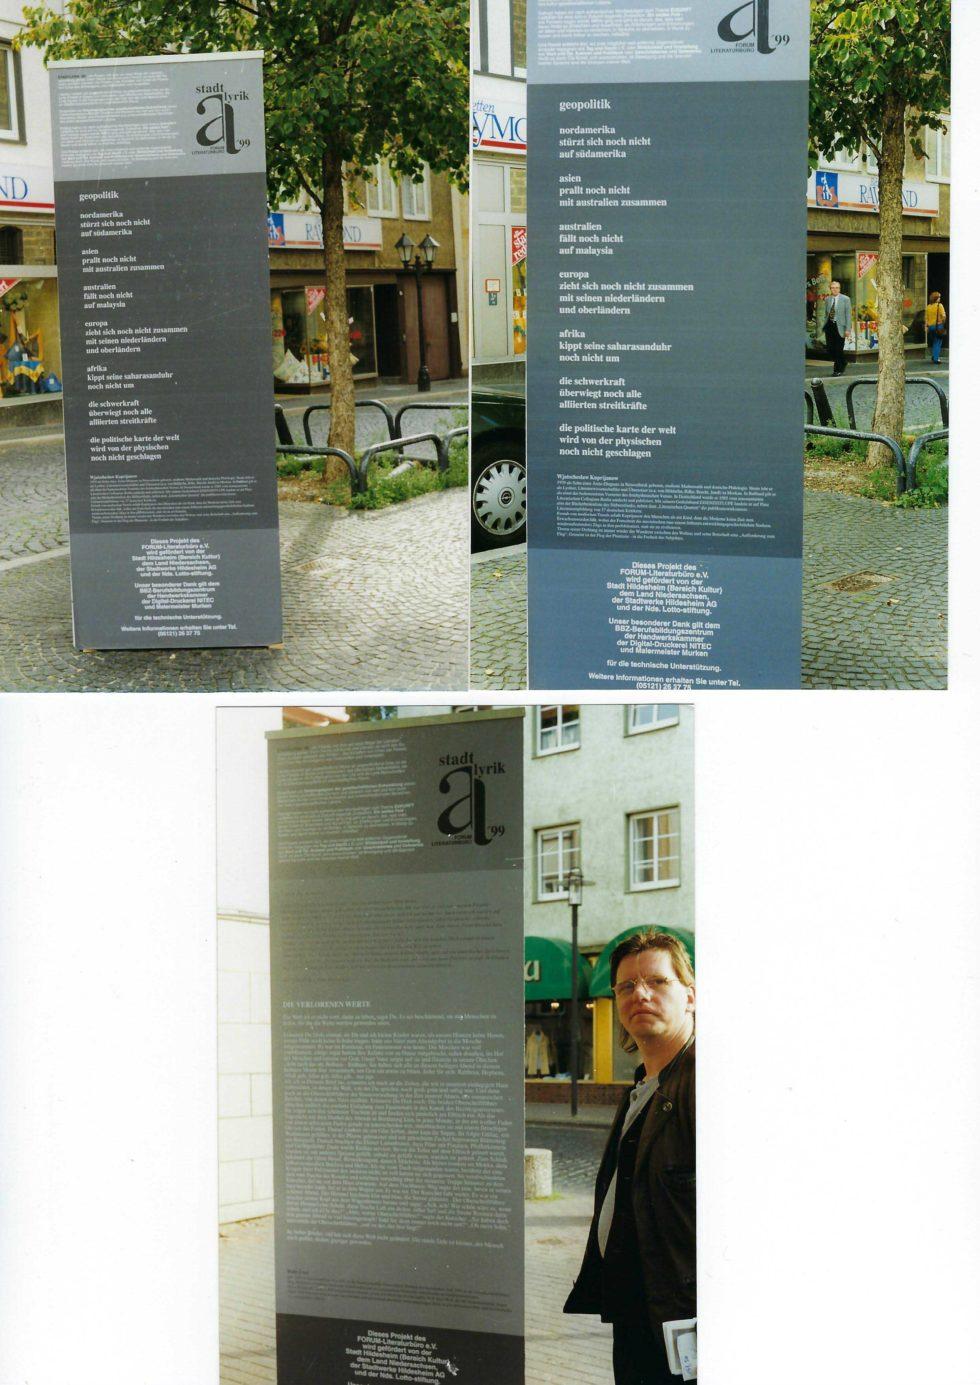 29_Stadtlyrik_1999_PoetsCorner